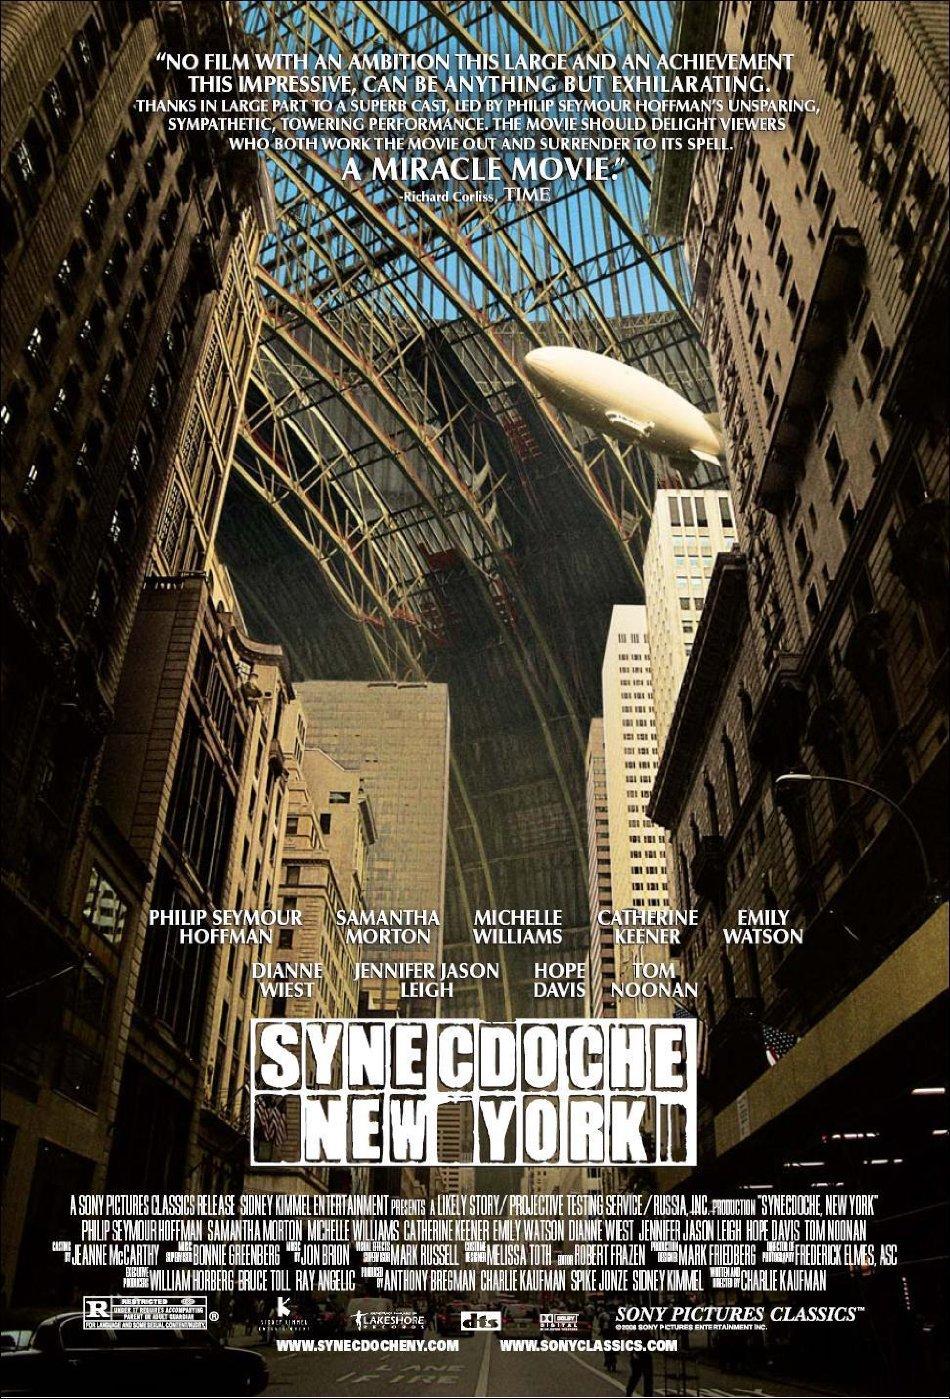 "SYNECDOCHE, NEW YORK Original Movie Poster * PHILIP SEYMOUR HOFFMAN * 27"" x 40"" Rare 2008 Mint"